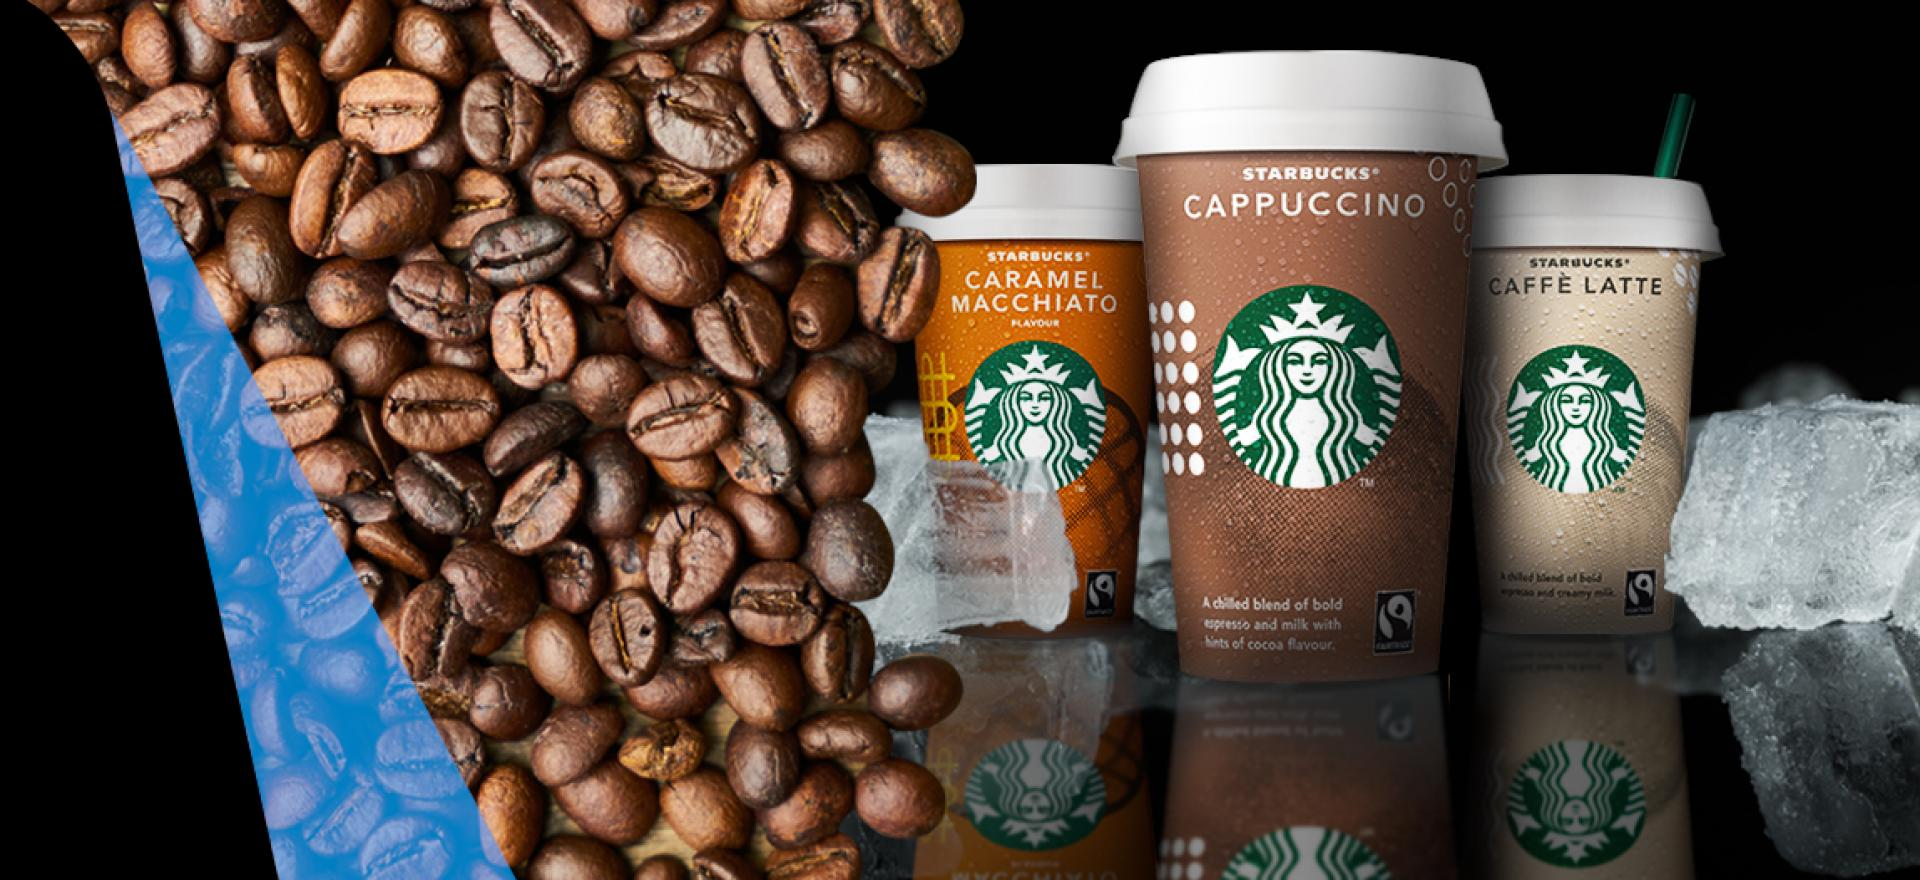 Starbucks Soğuk Kahveler